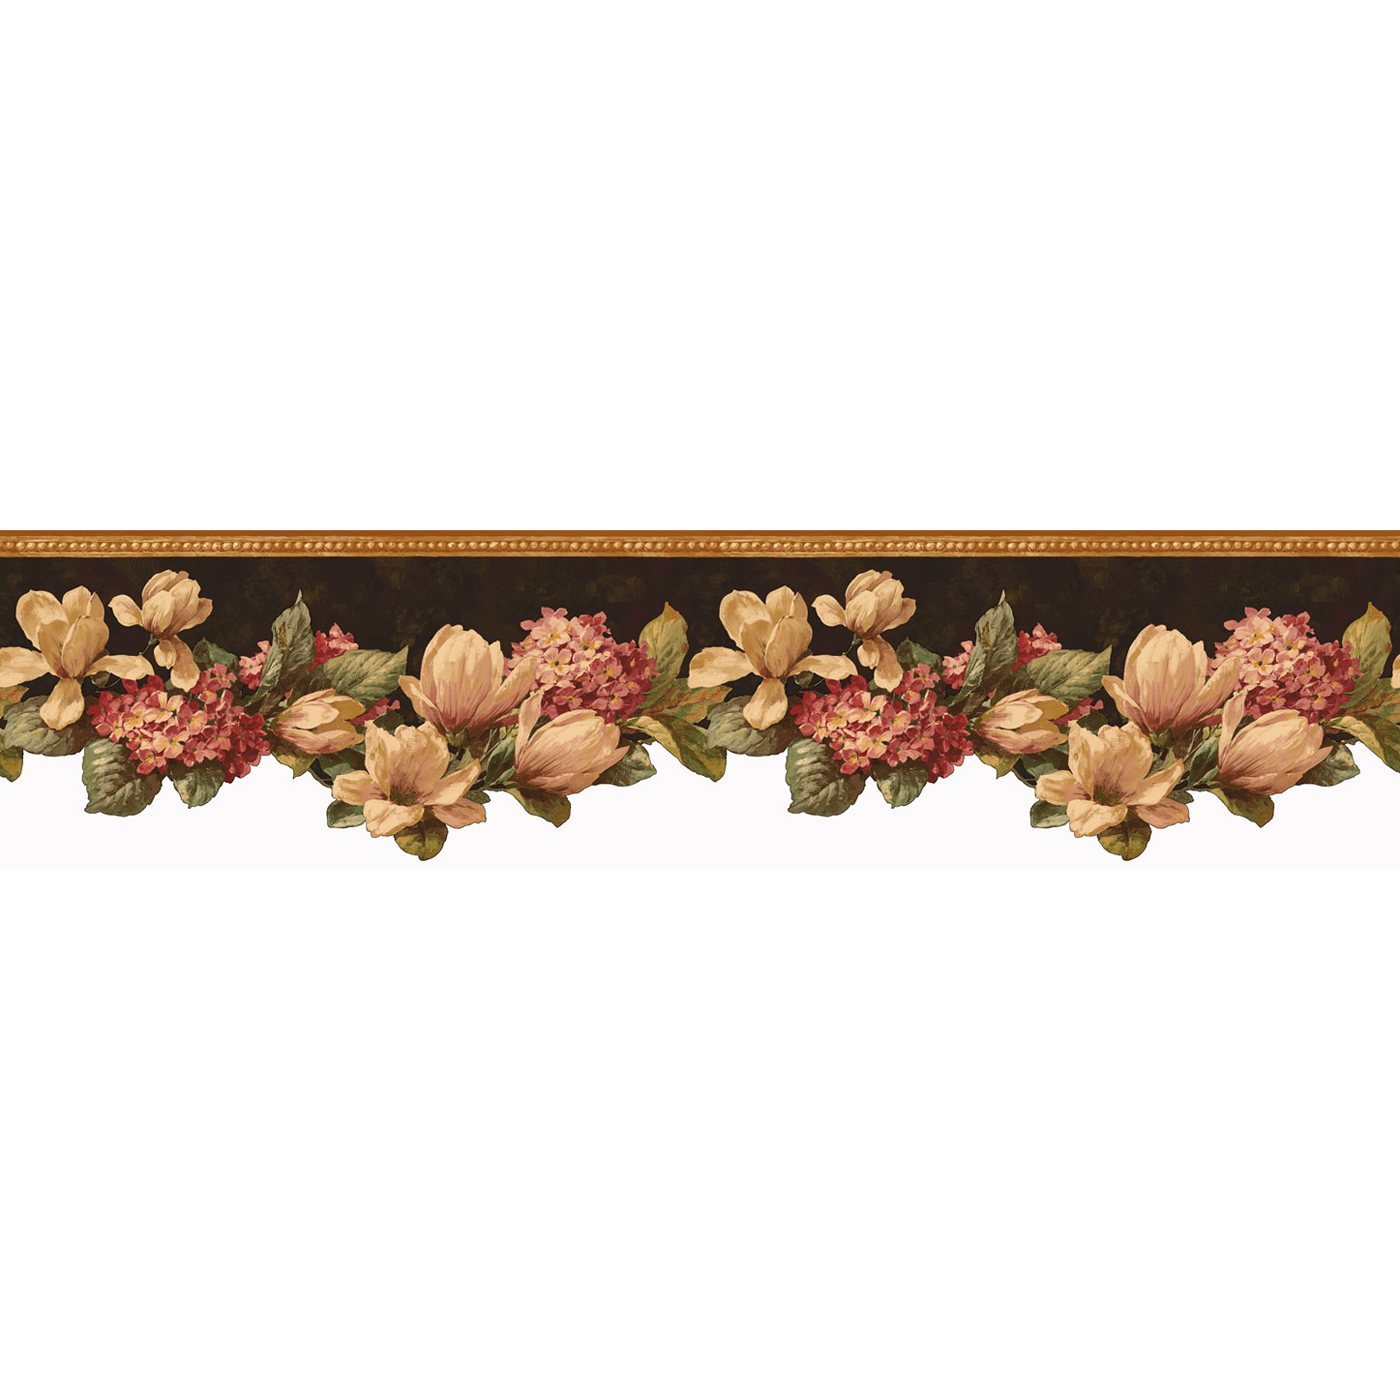 FFM10301B French Flea Market Magnolia Wallpaper Border ATG Stores 1400x1400